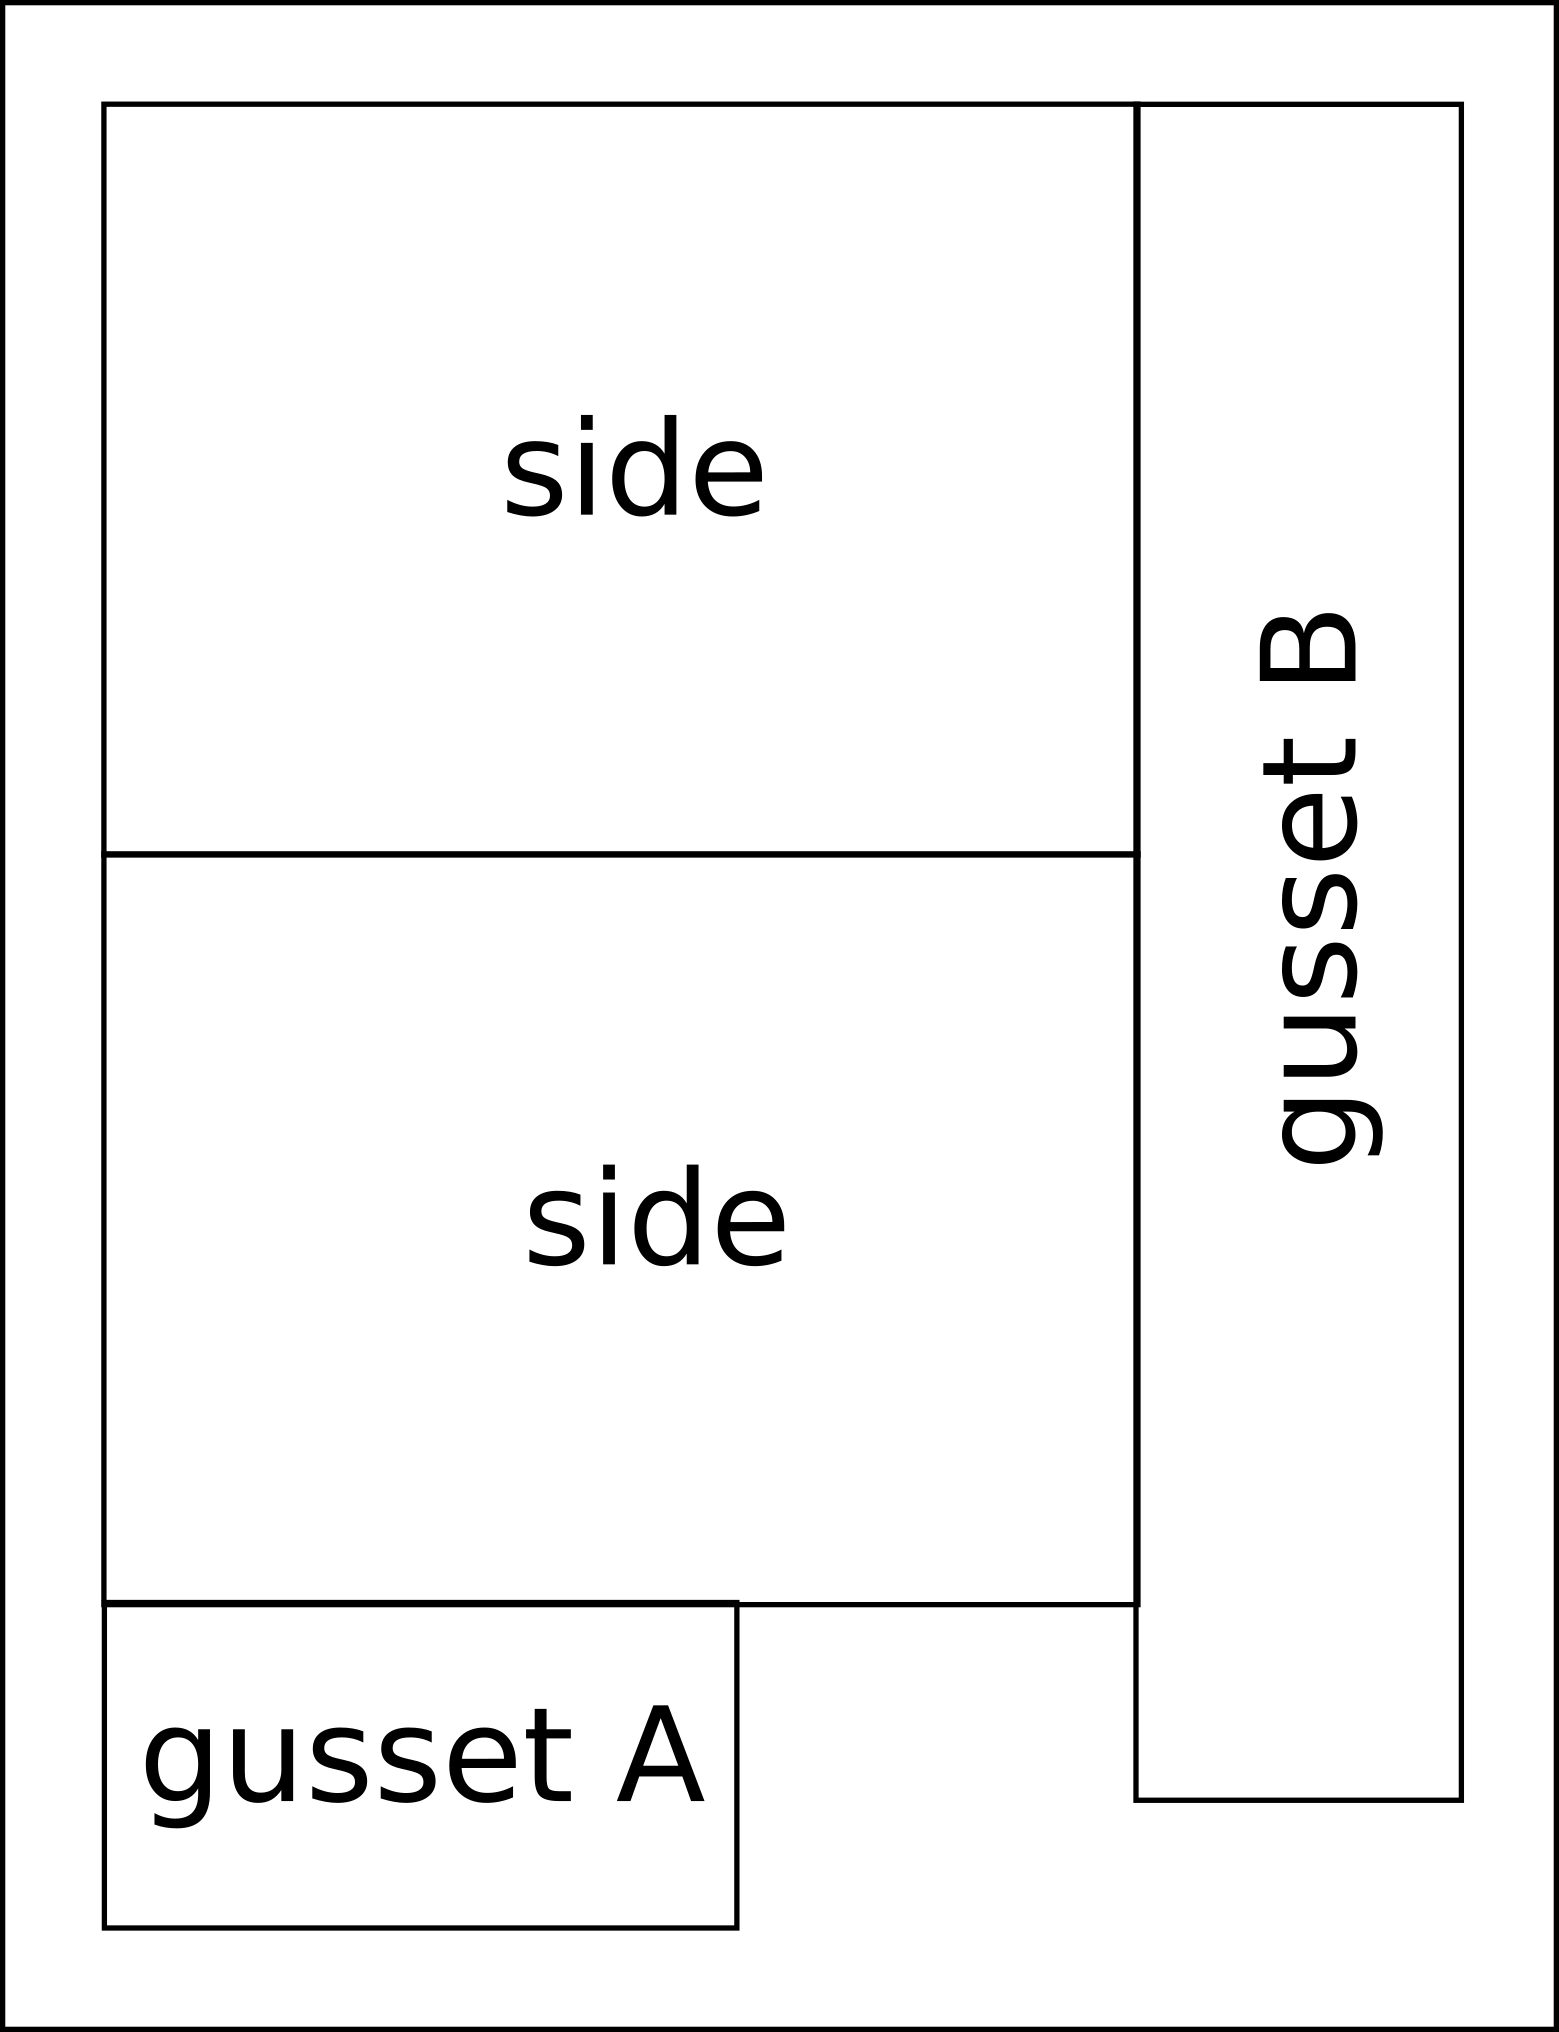 Quilted Piece A - fat quarter diagram